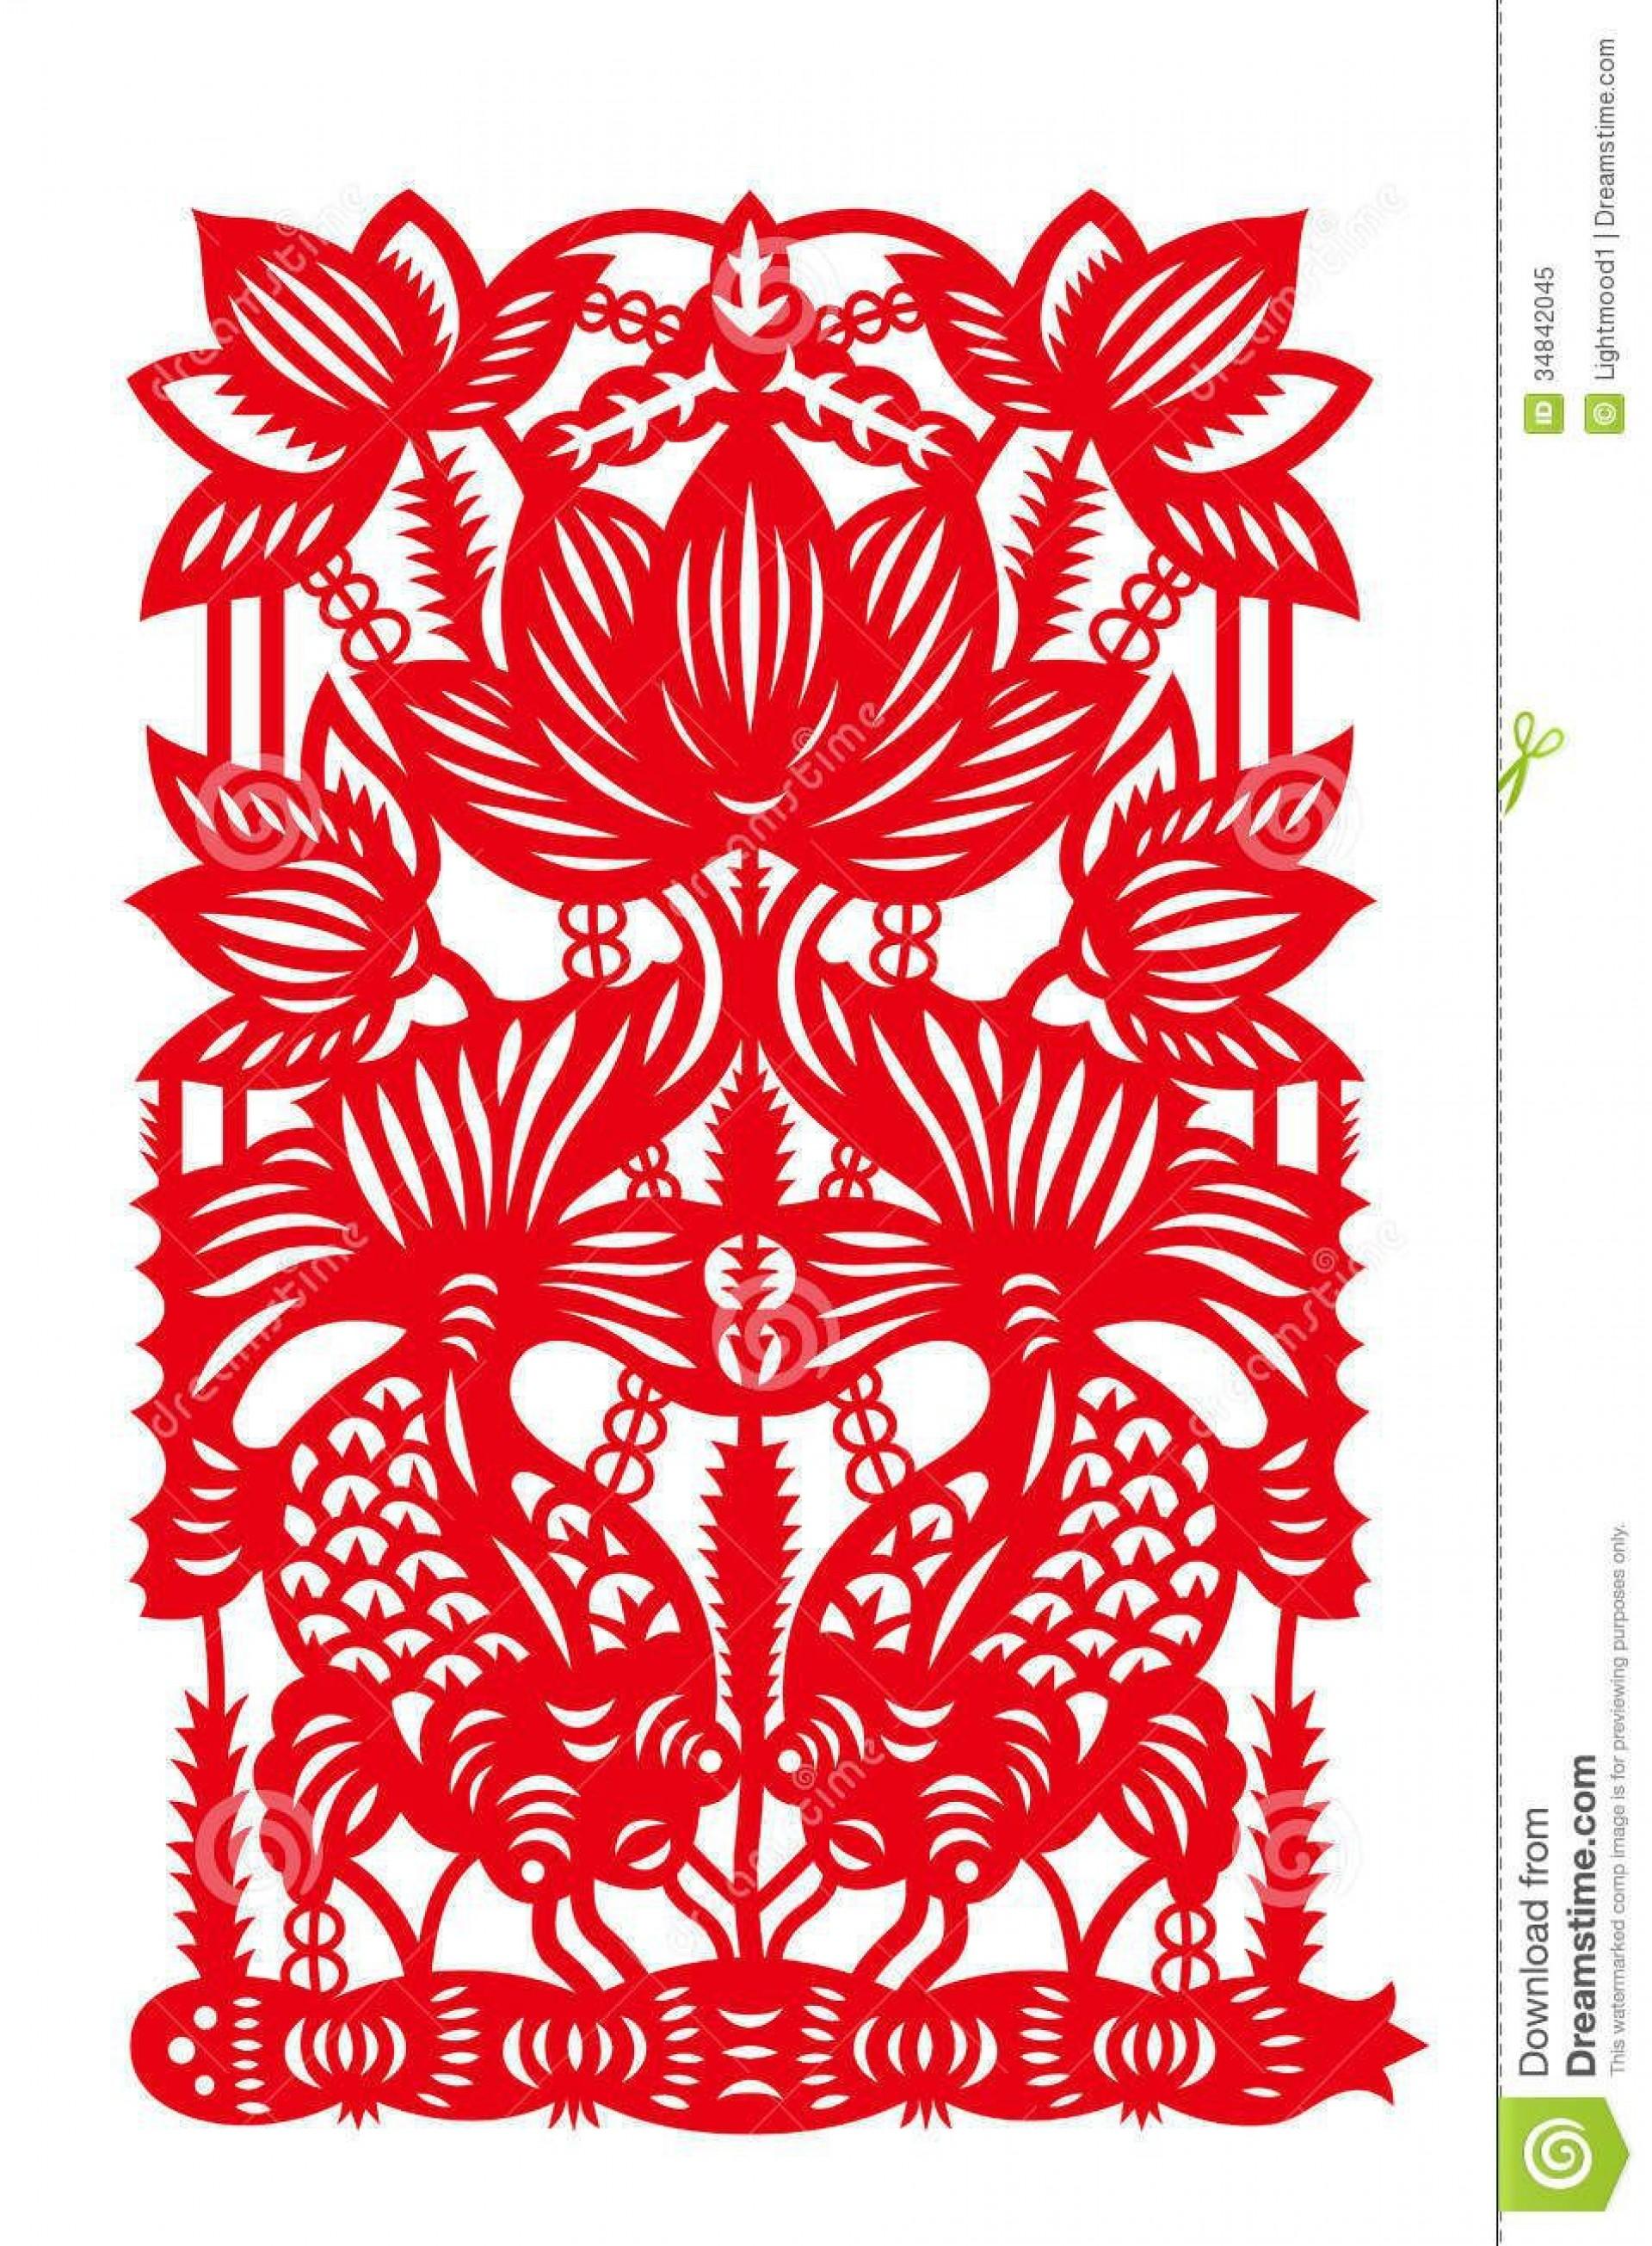 000 Breathtaking Chinese Paper Cut Template Photo  Templates Zodiac1920